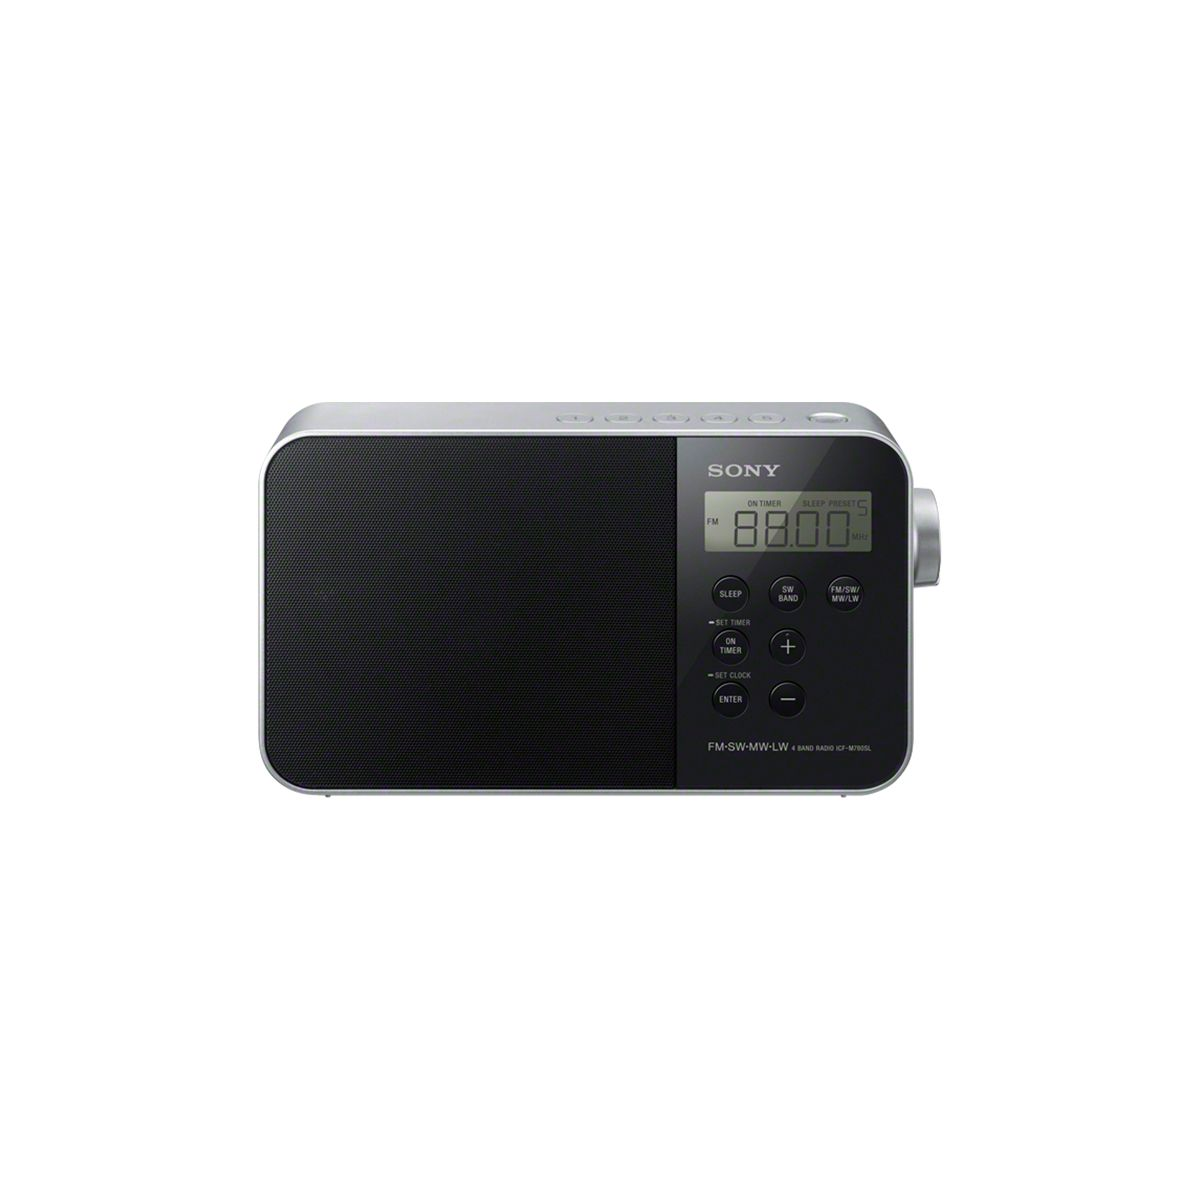 Radio analogique sony icfm780slb.ced noir - livraison offerte : code premium